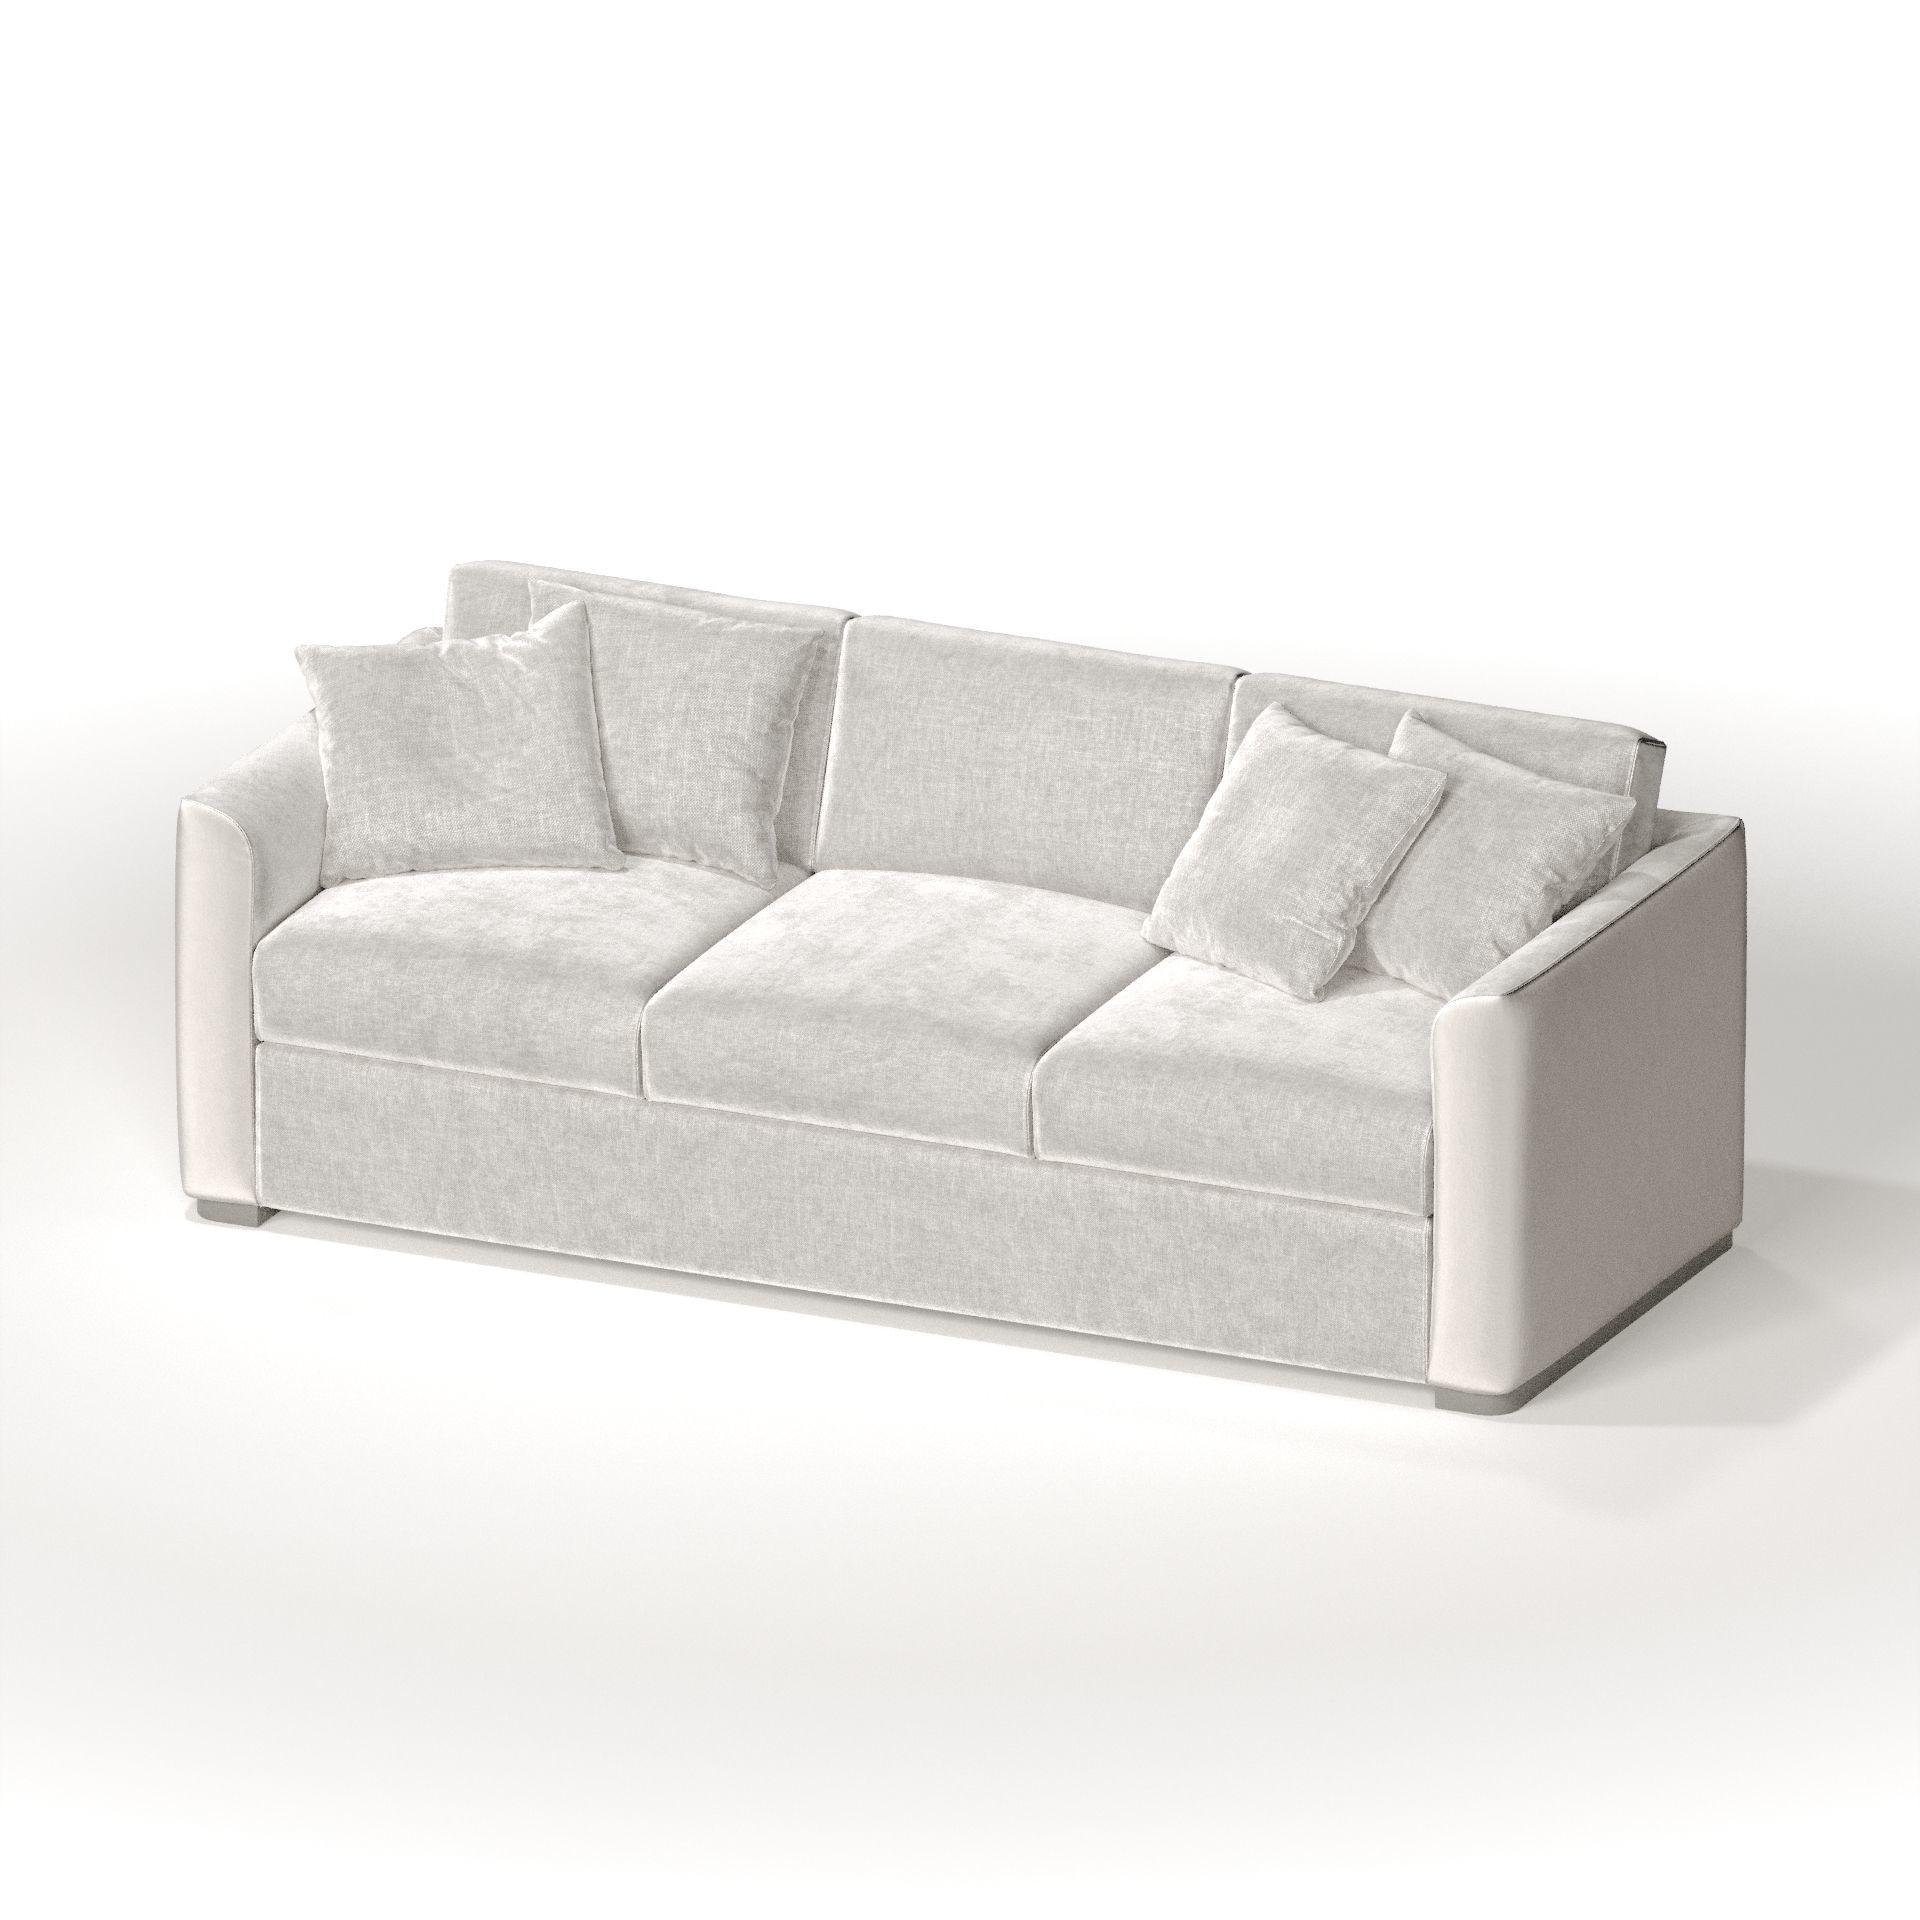 a rudin sofa 2859 bonded leather falling apart 3d 2786 cgtrader model max obj mtl fbx 3